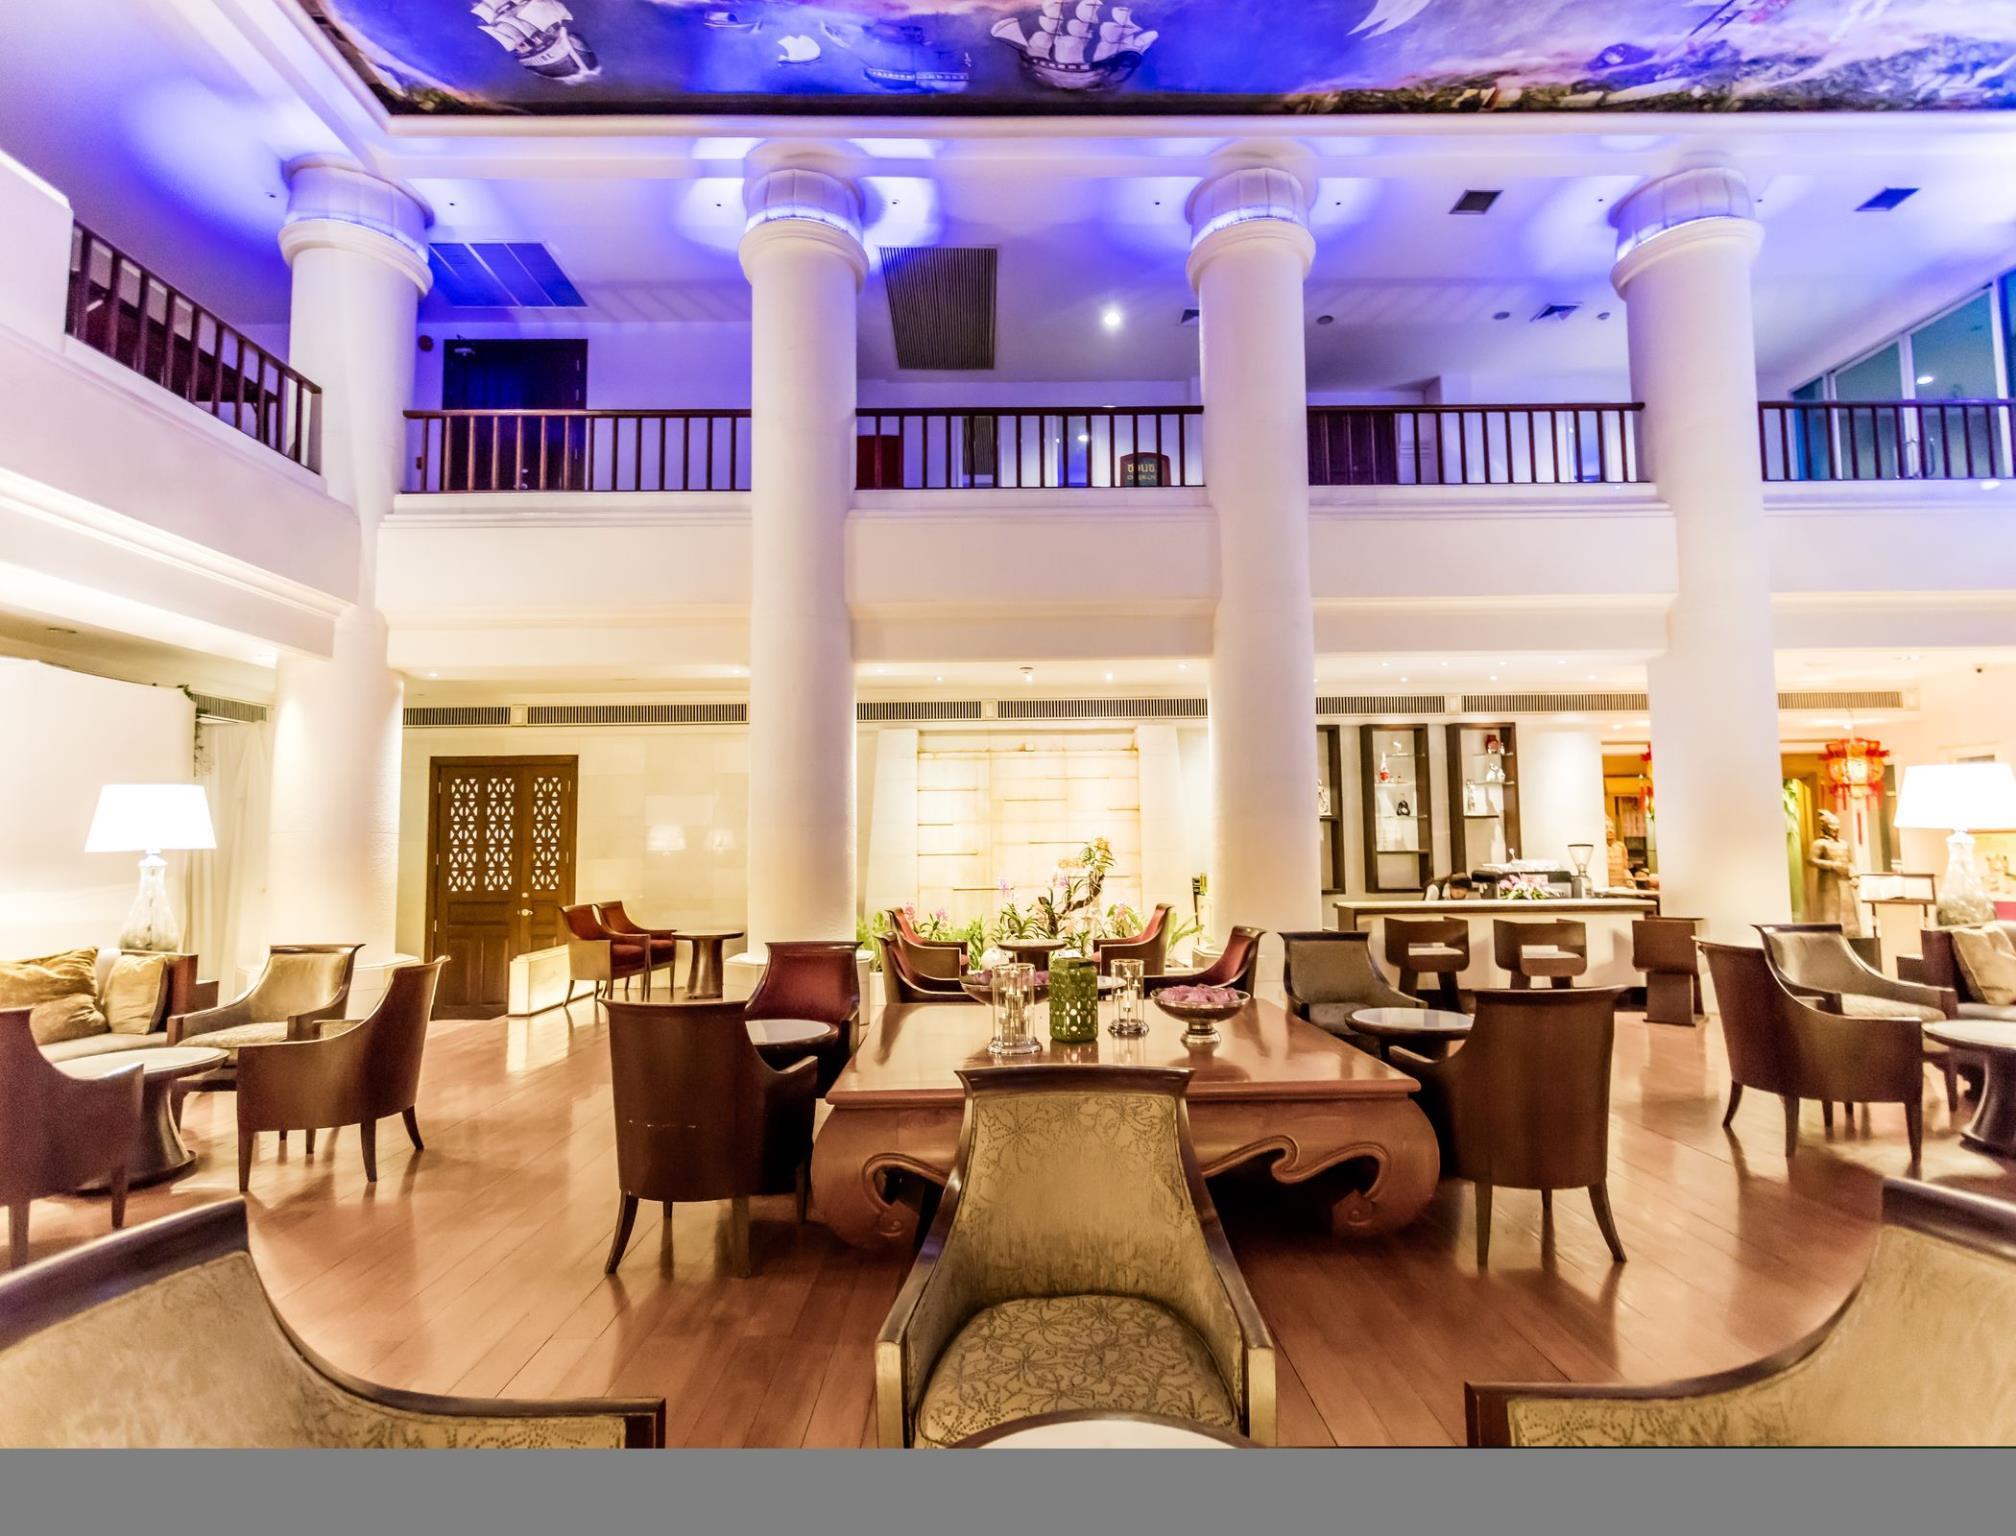 Krungsri River Hotel, Phra Nakhon Si Ayutthaya